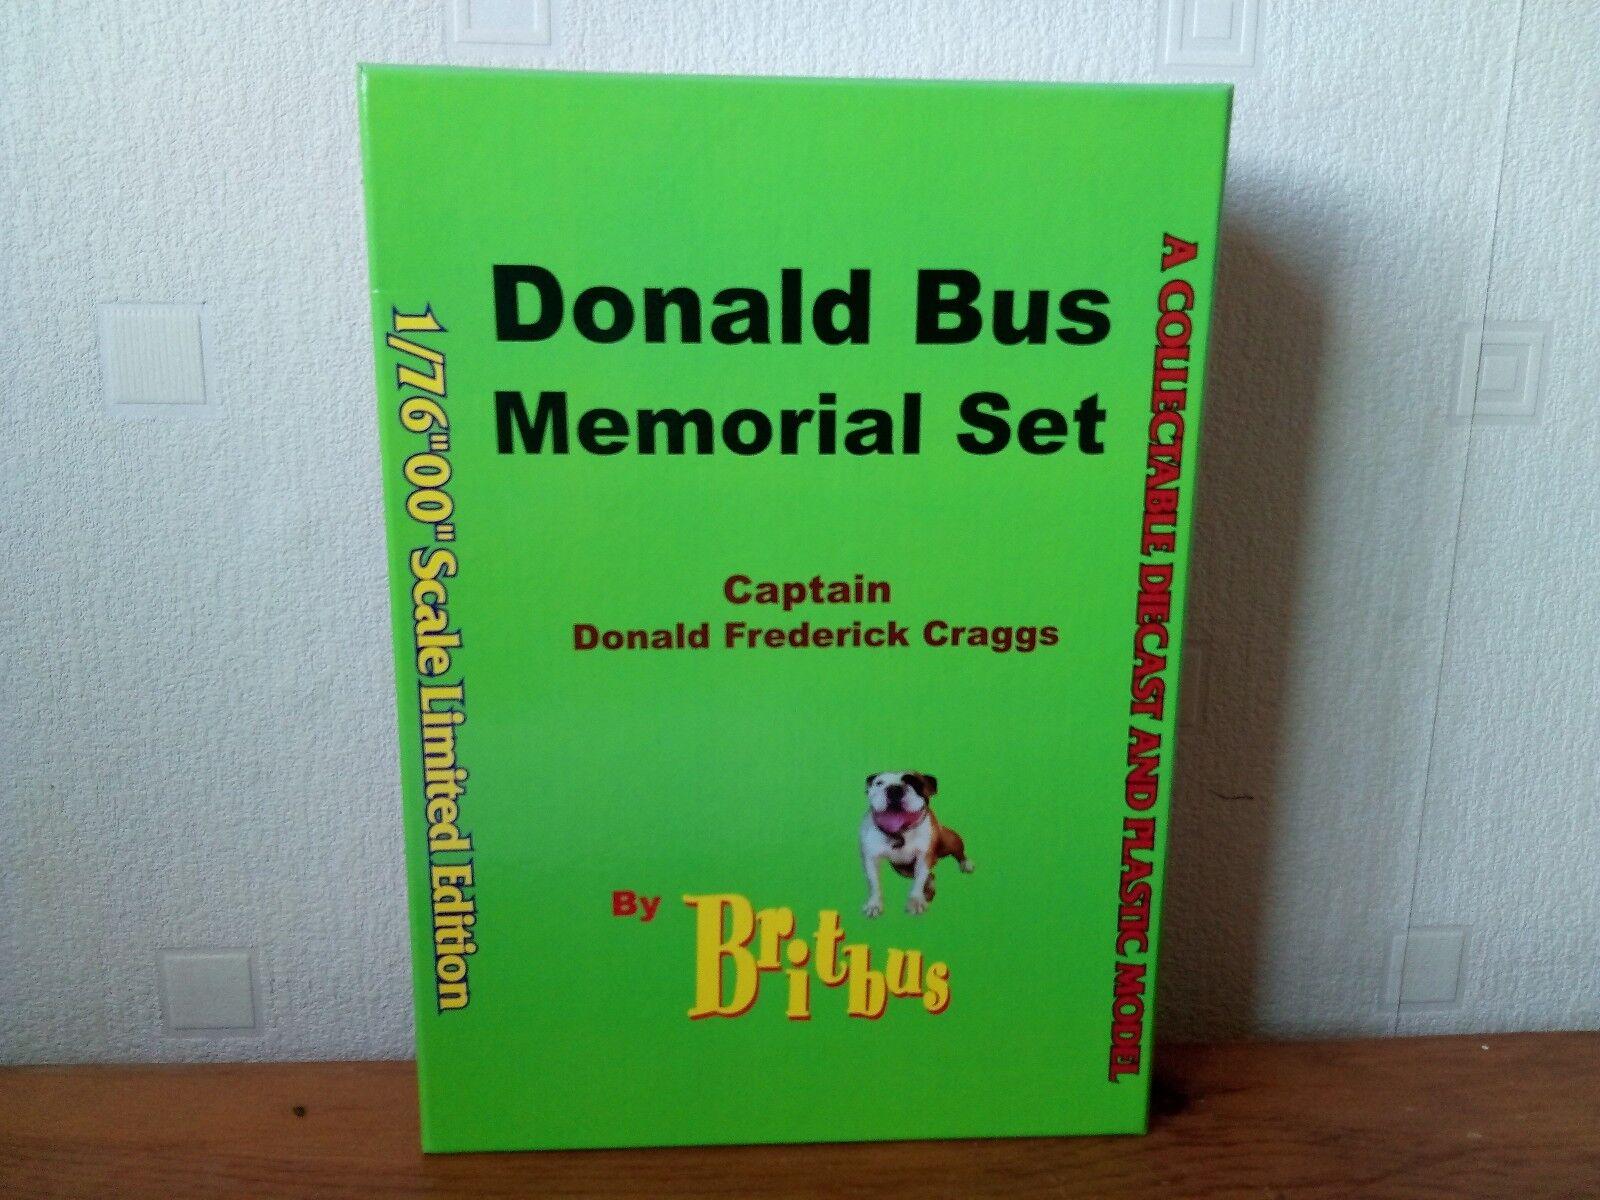 BRITBUS DONALD CRAGGS BUS SET